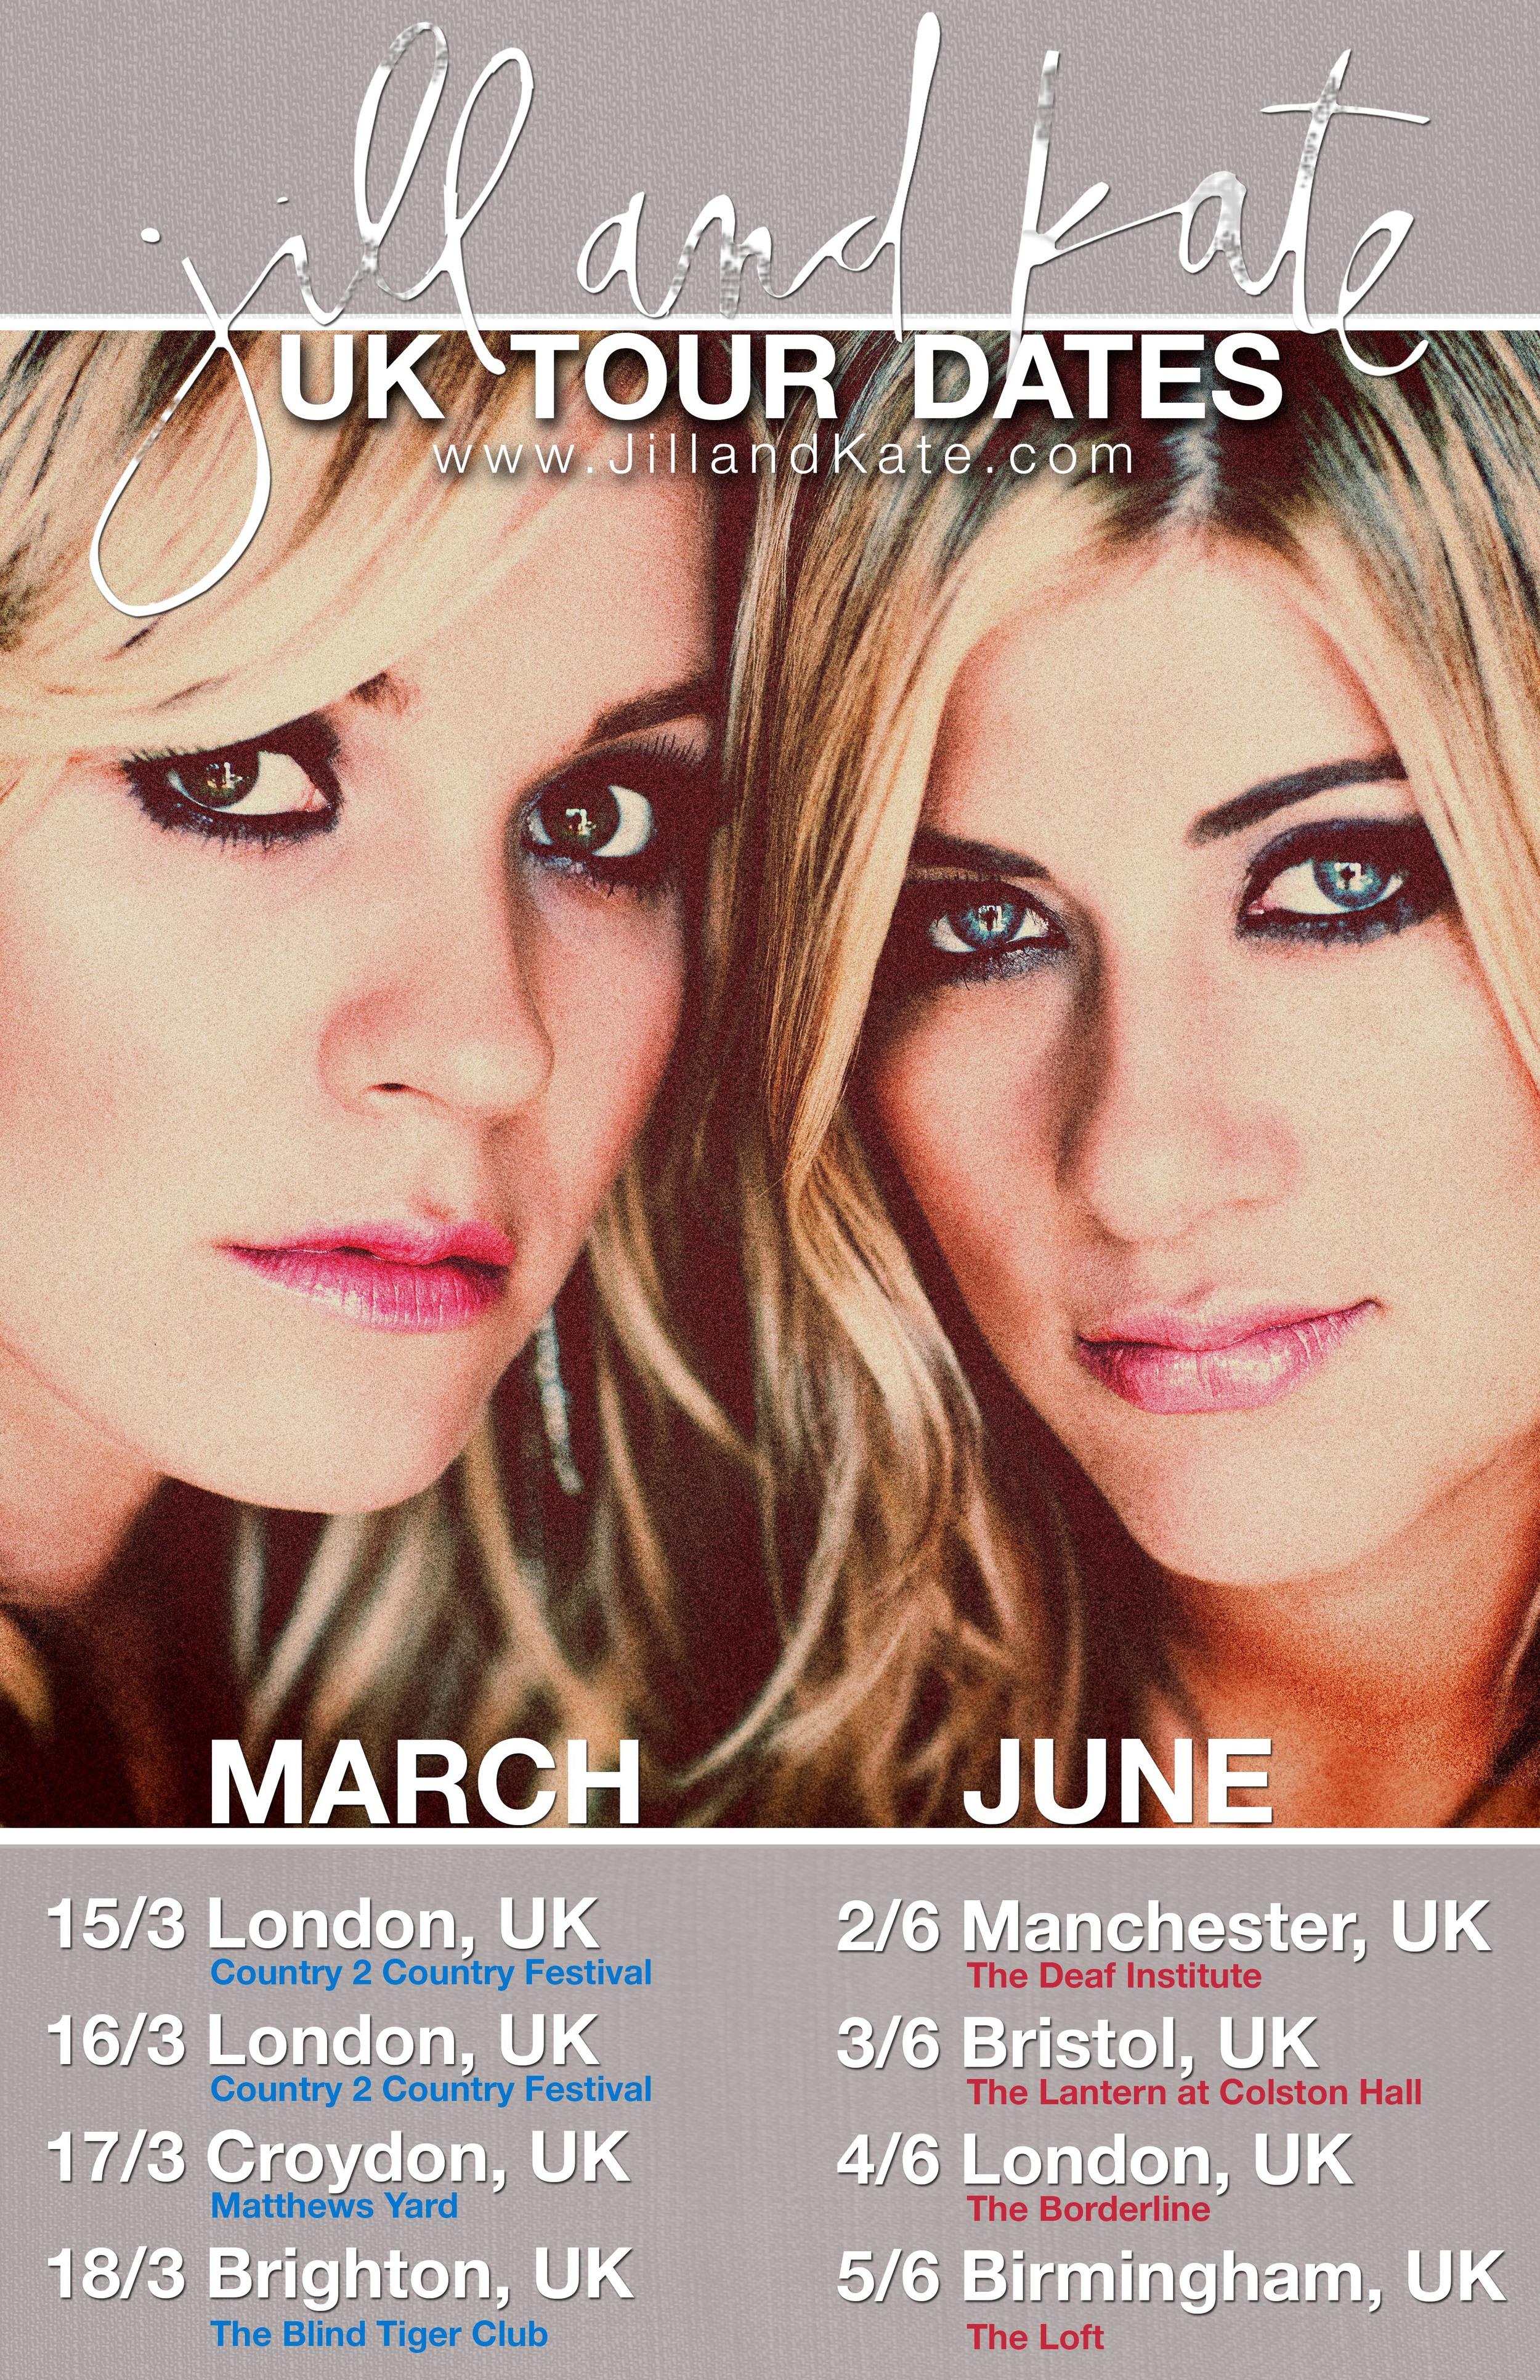 LondonDates2014-1